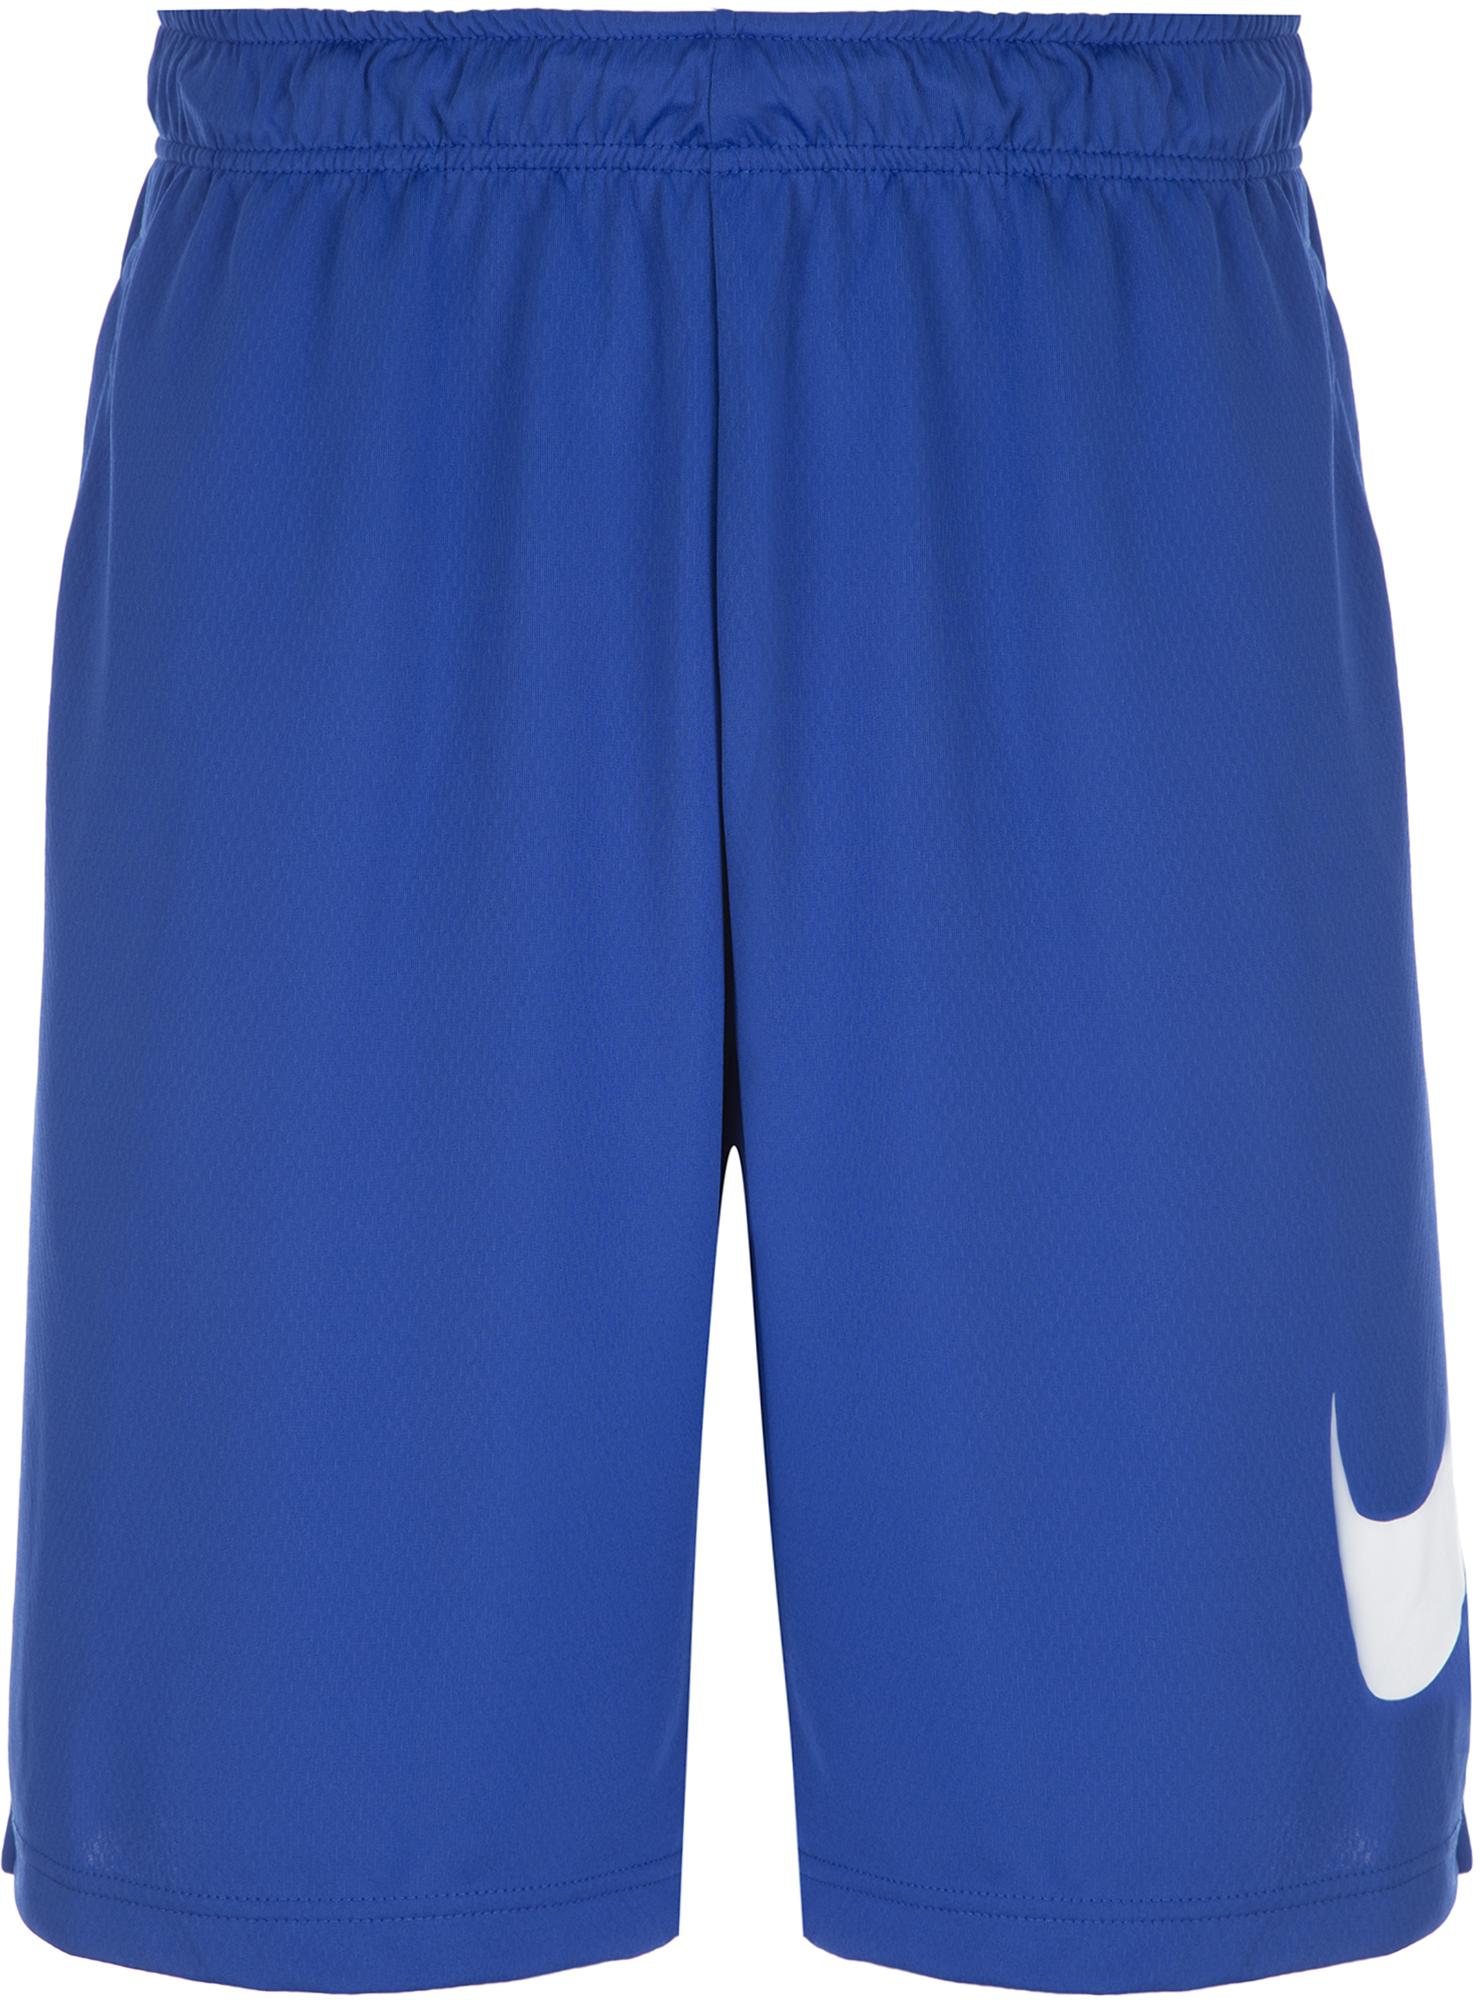 Nike Шорты мужские Dry, размер 52-54